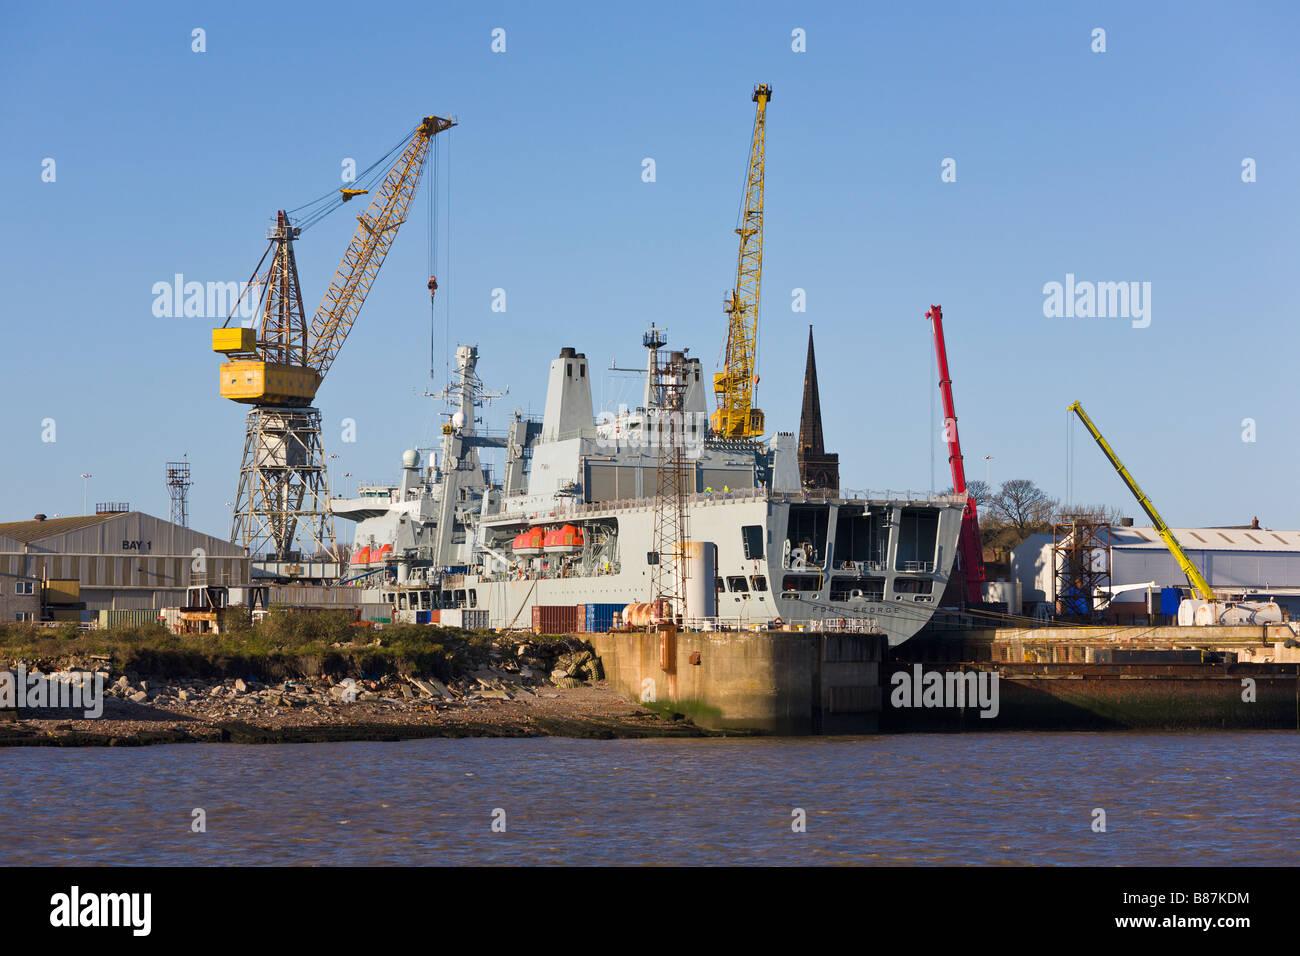 Ship repairs, Camel Lairds ship yard, River Mersey, Birkenhead, Merseyside, England - Stock Image